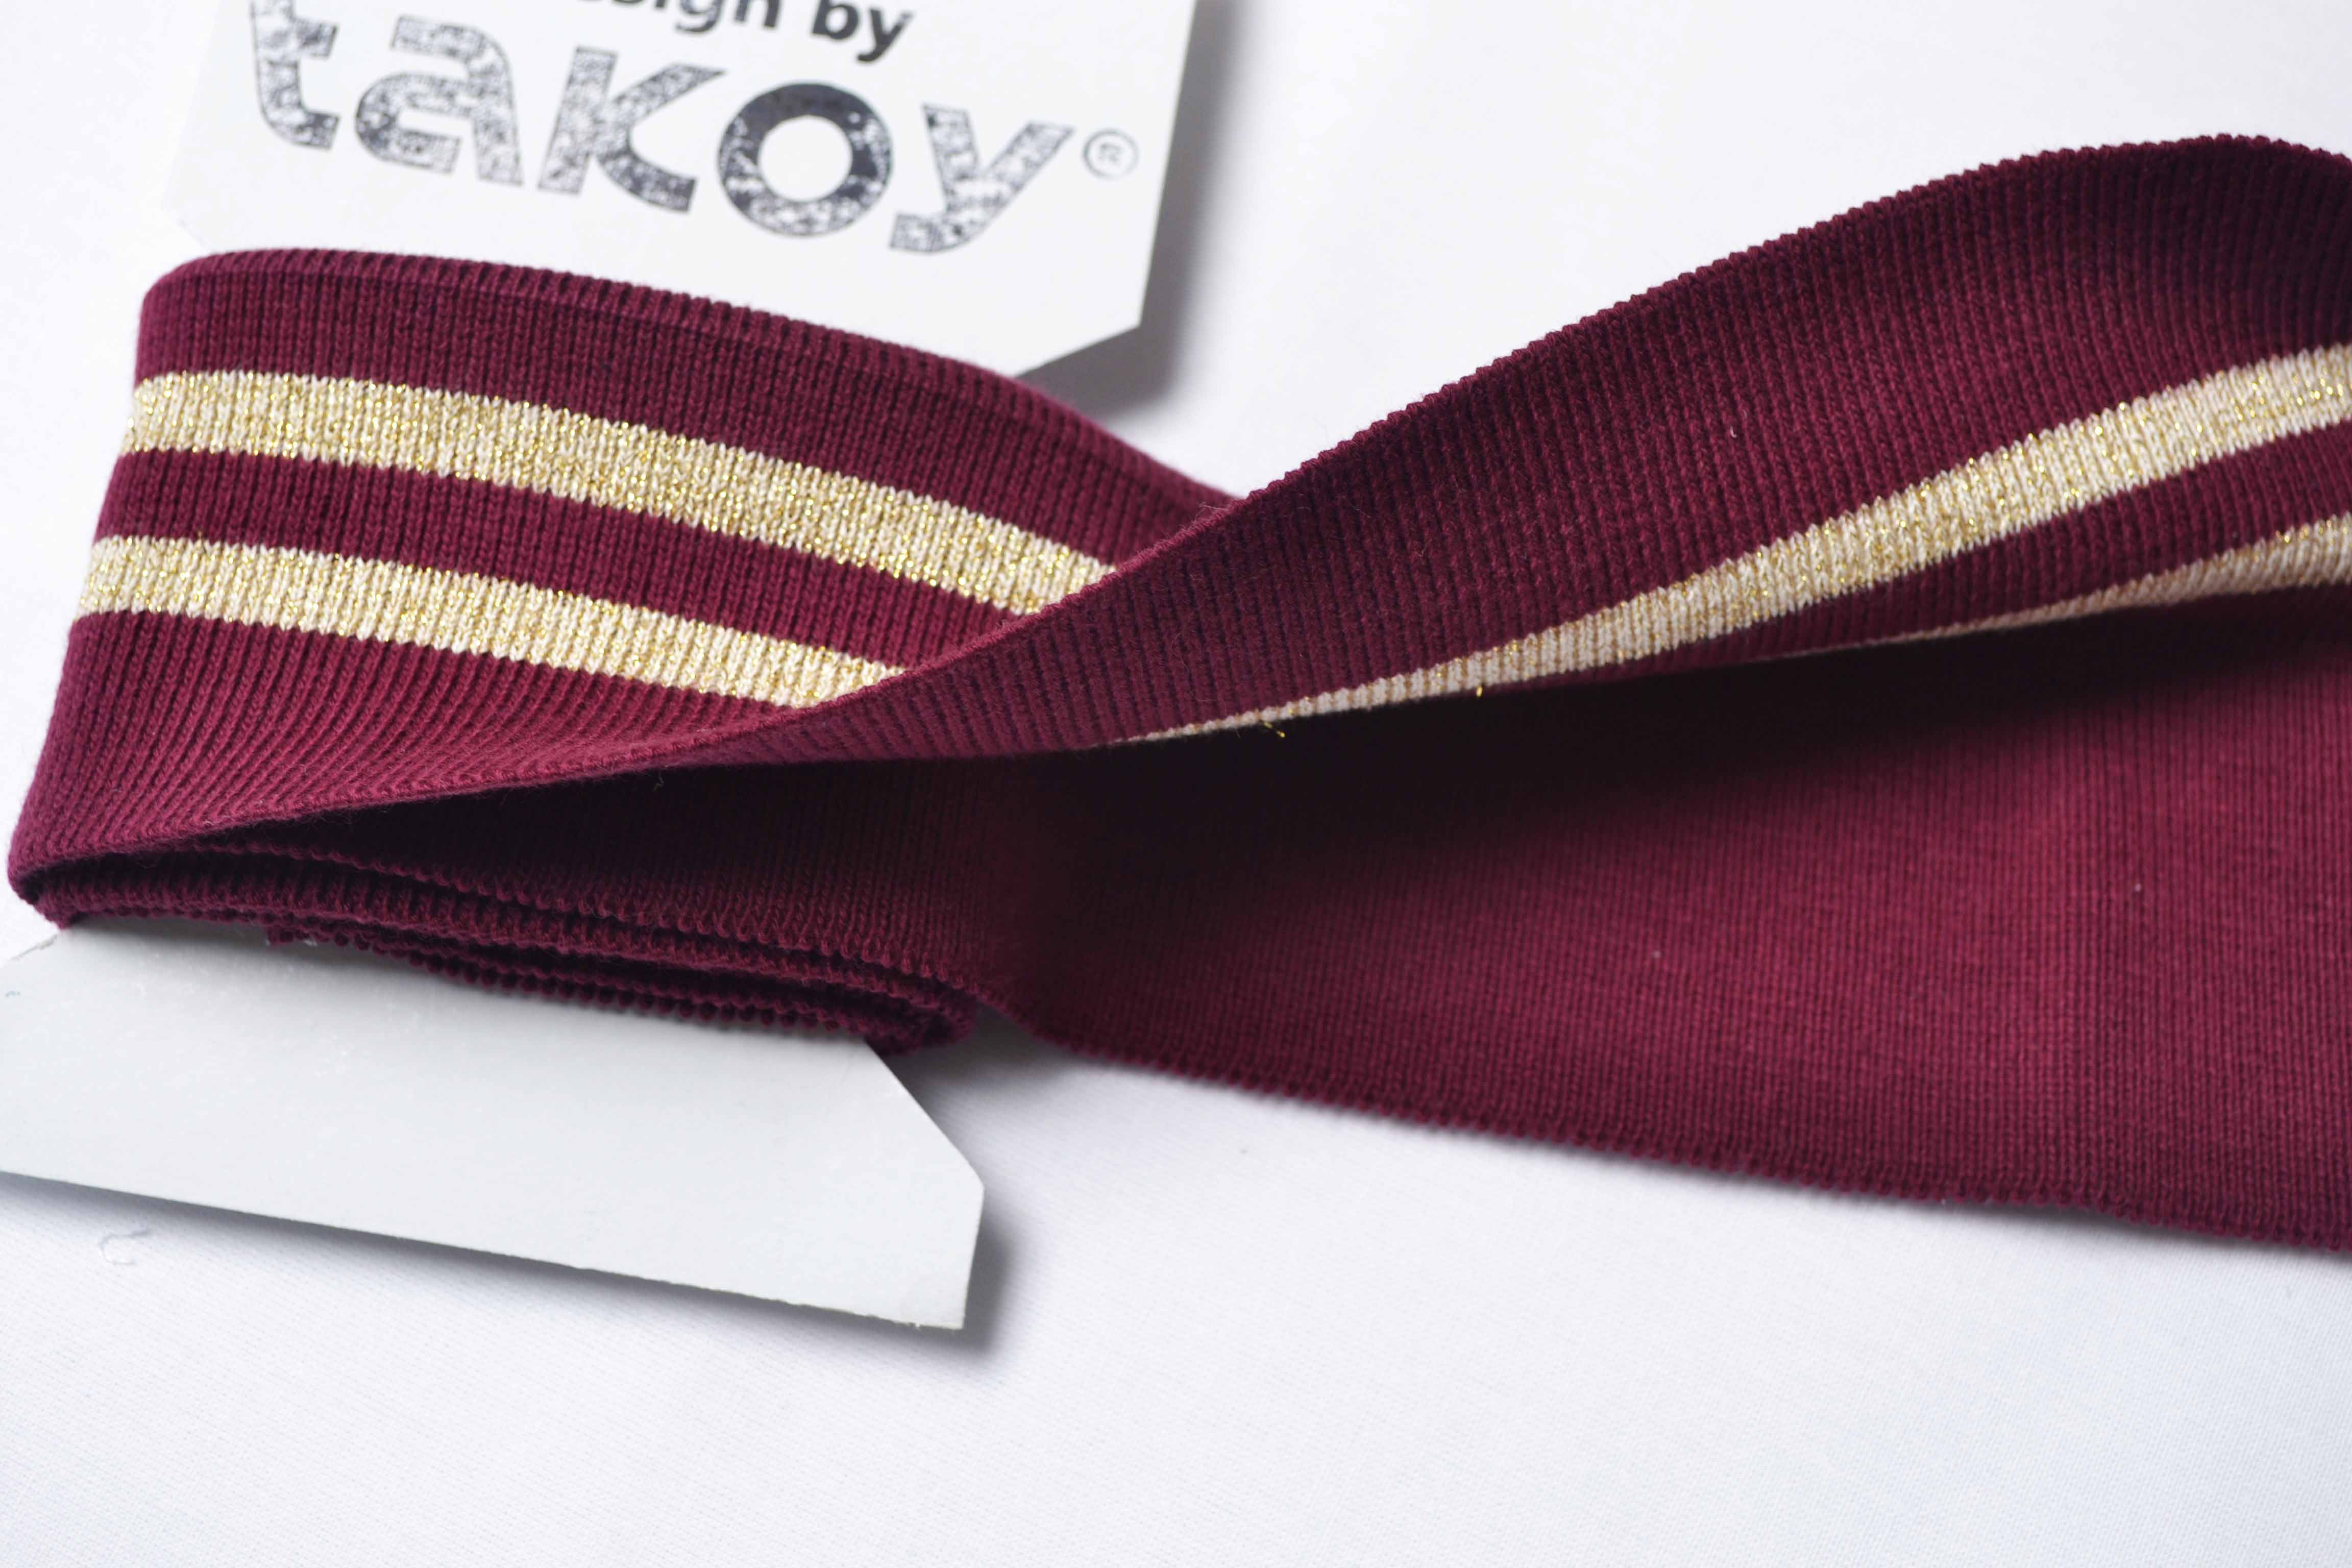 tessuto-bordo-a-coste-bordò/oro-new